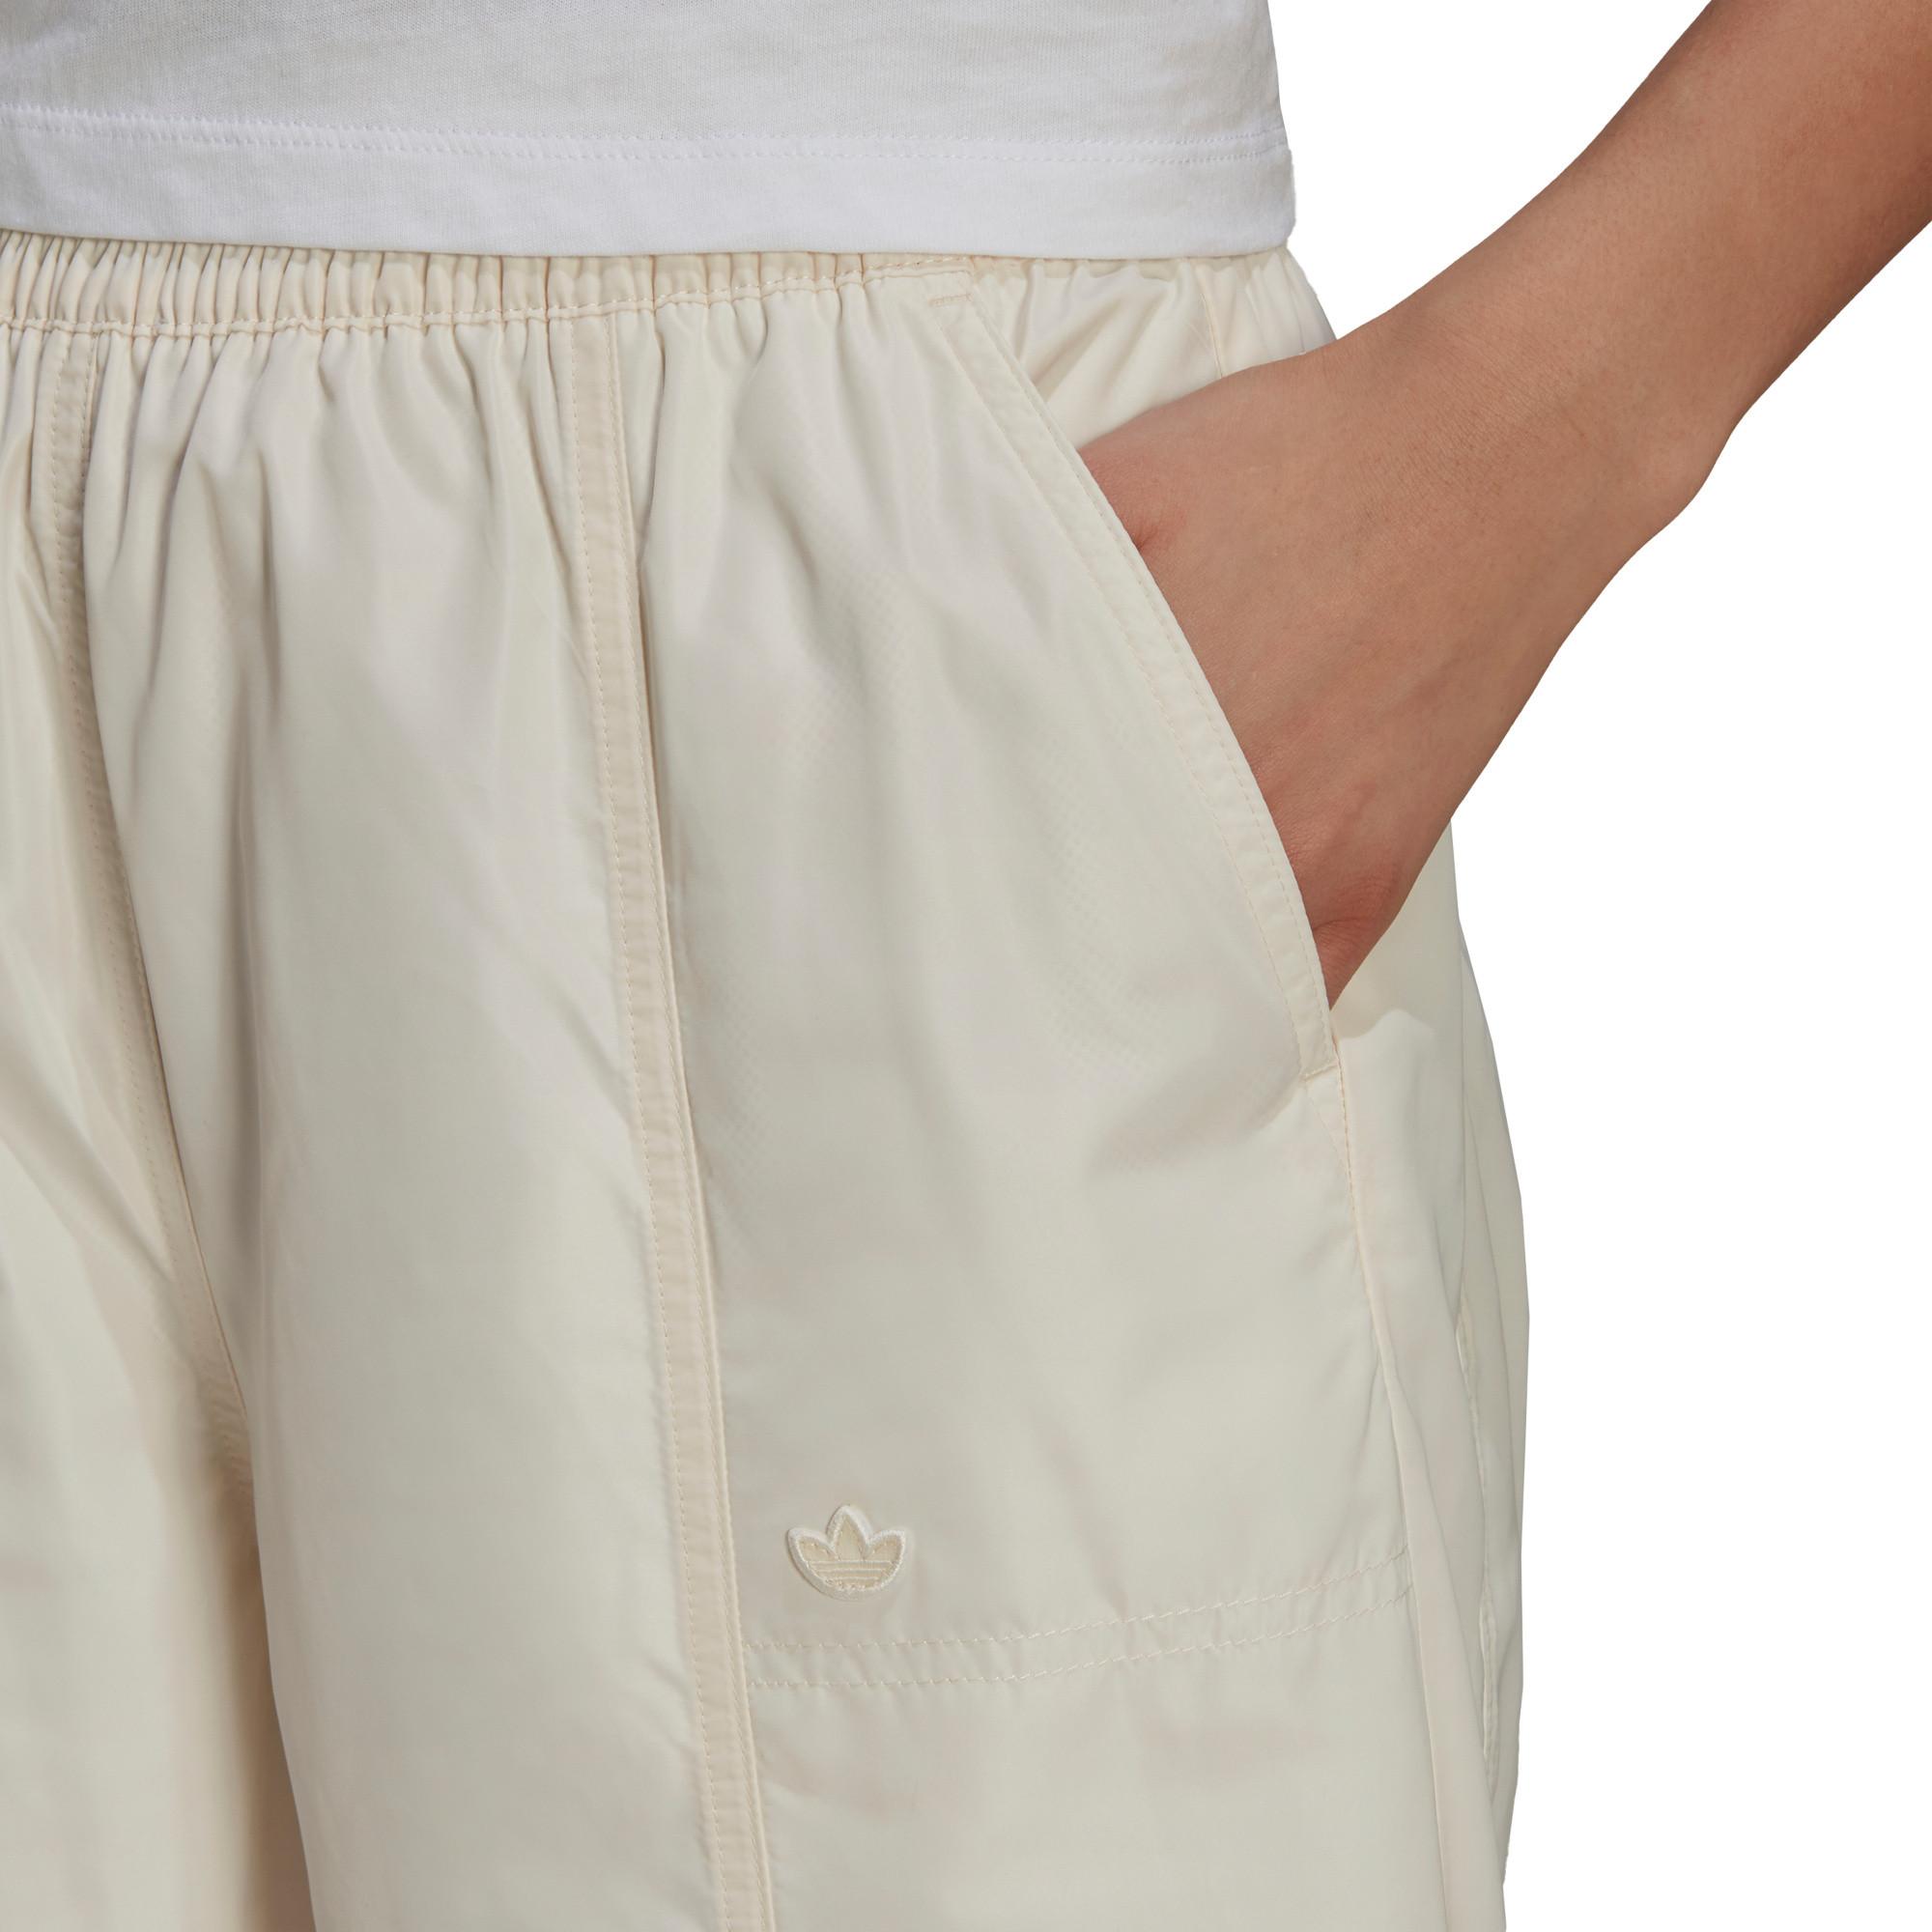 Track pants adicolor Nylon, Bianco, large image number 4